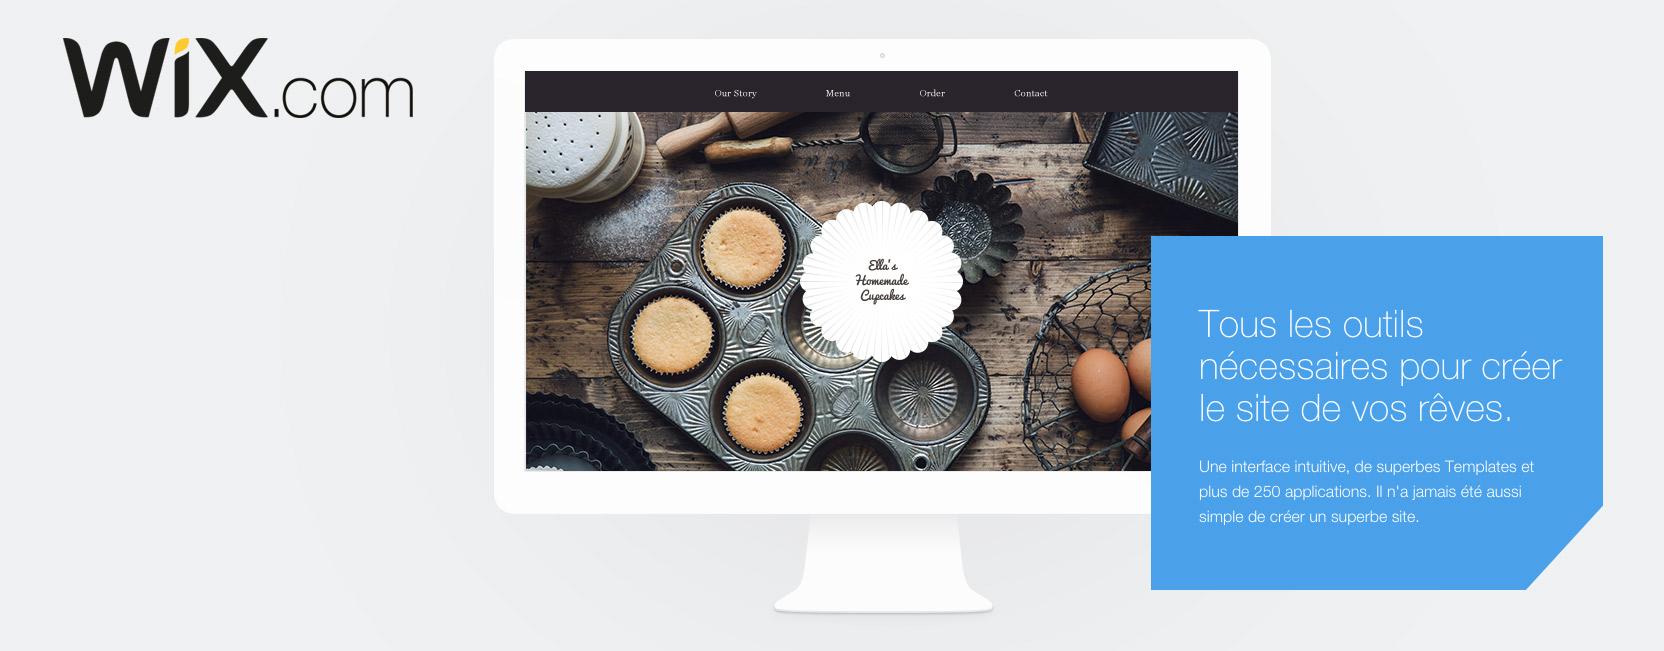 wix site web